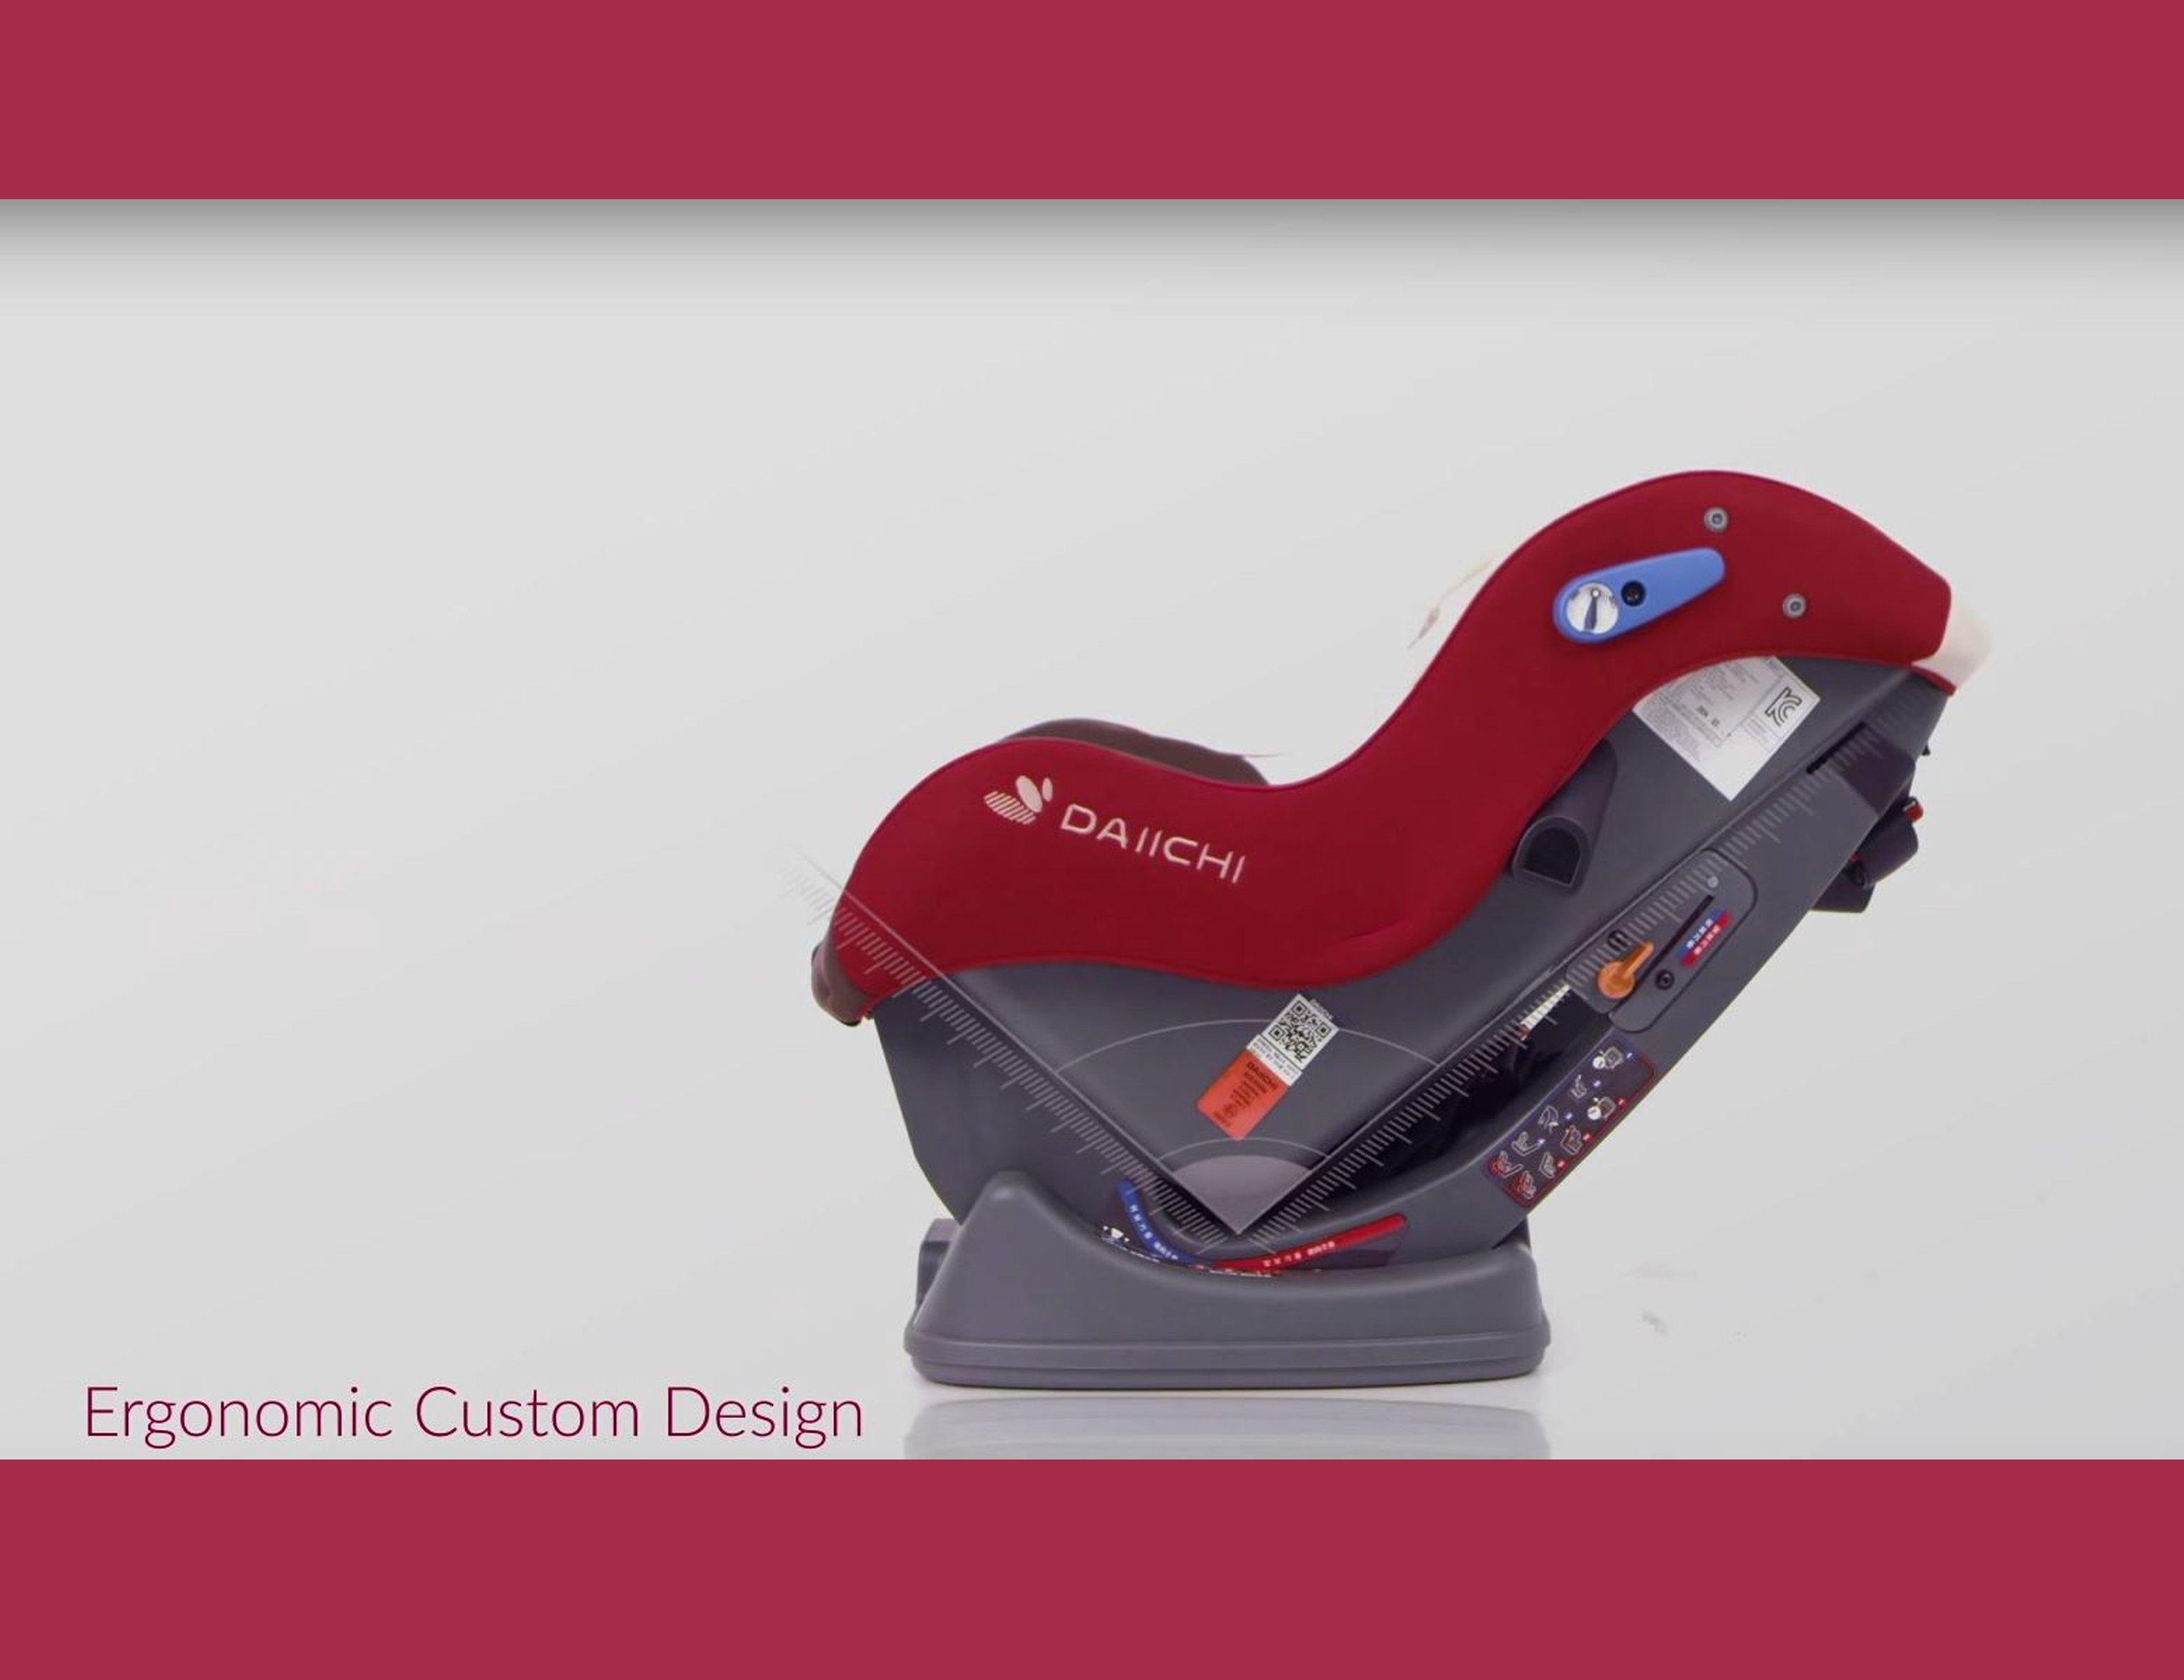 DAIICHI CAR SEAT DUALWELL ORGANIC RED Ergonomic